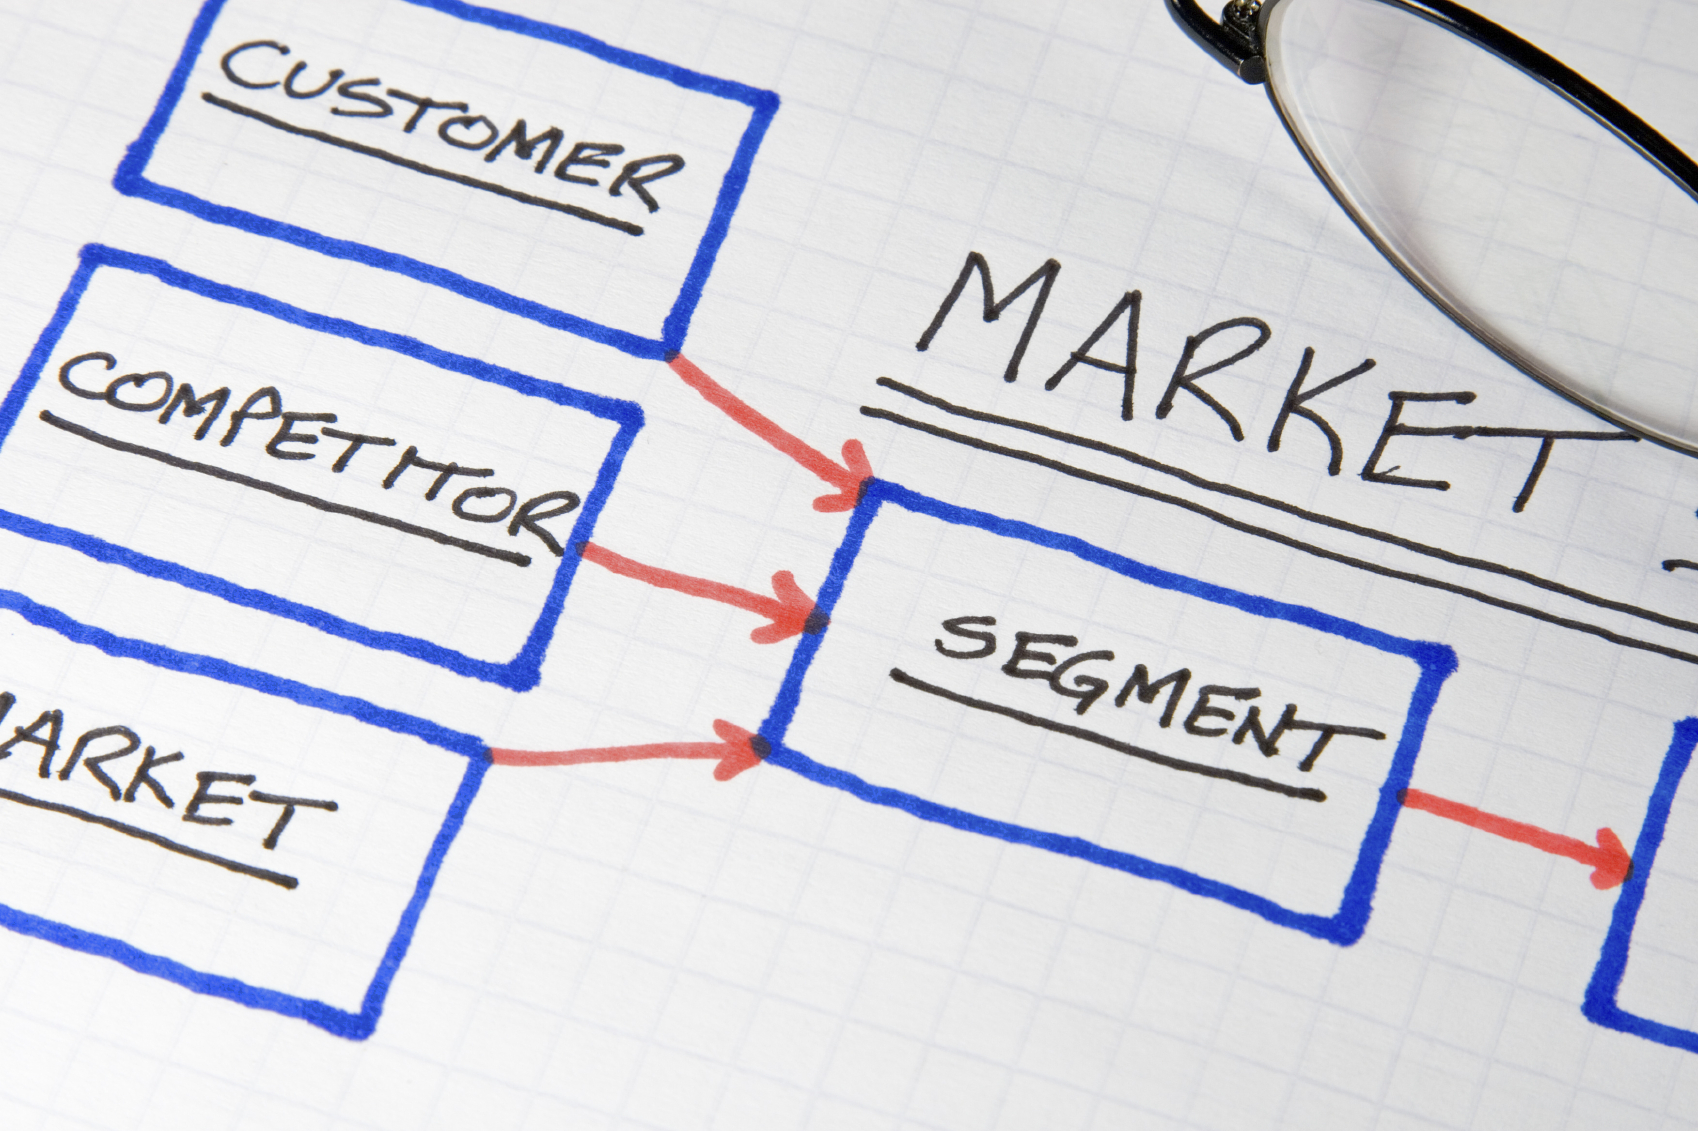 Software Market Segmentation Strategies